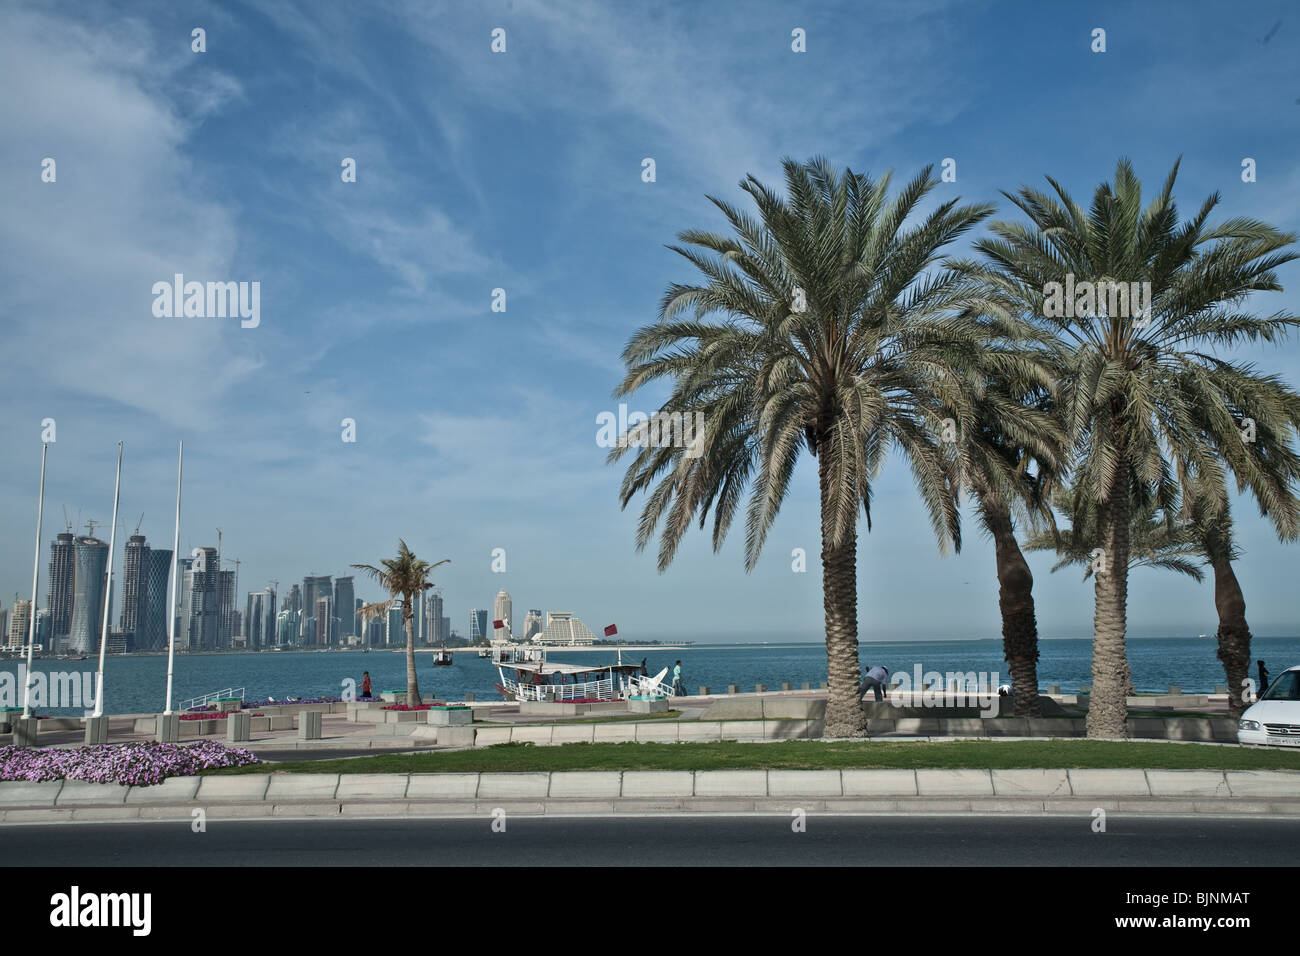 Qatar Oasis Stock Photos & Qatar Oasis Stock Images - Alamy